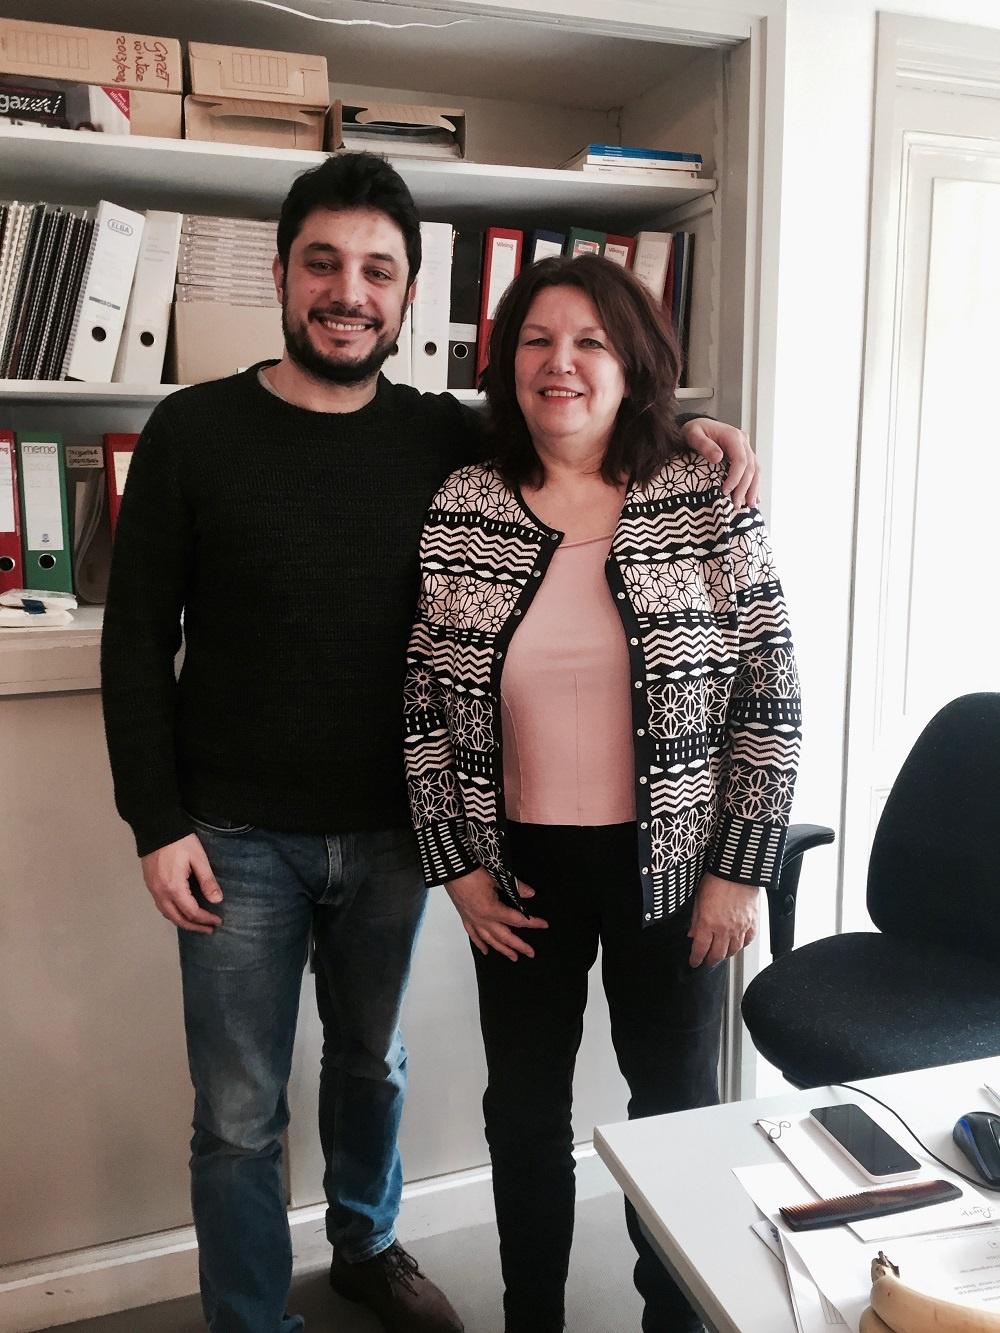 3rd report of my EYE in Amsterdam – Francesco Gallo